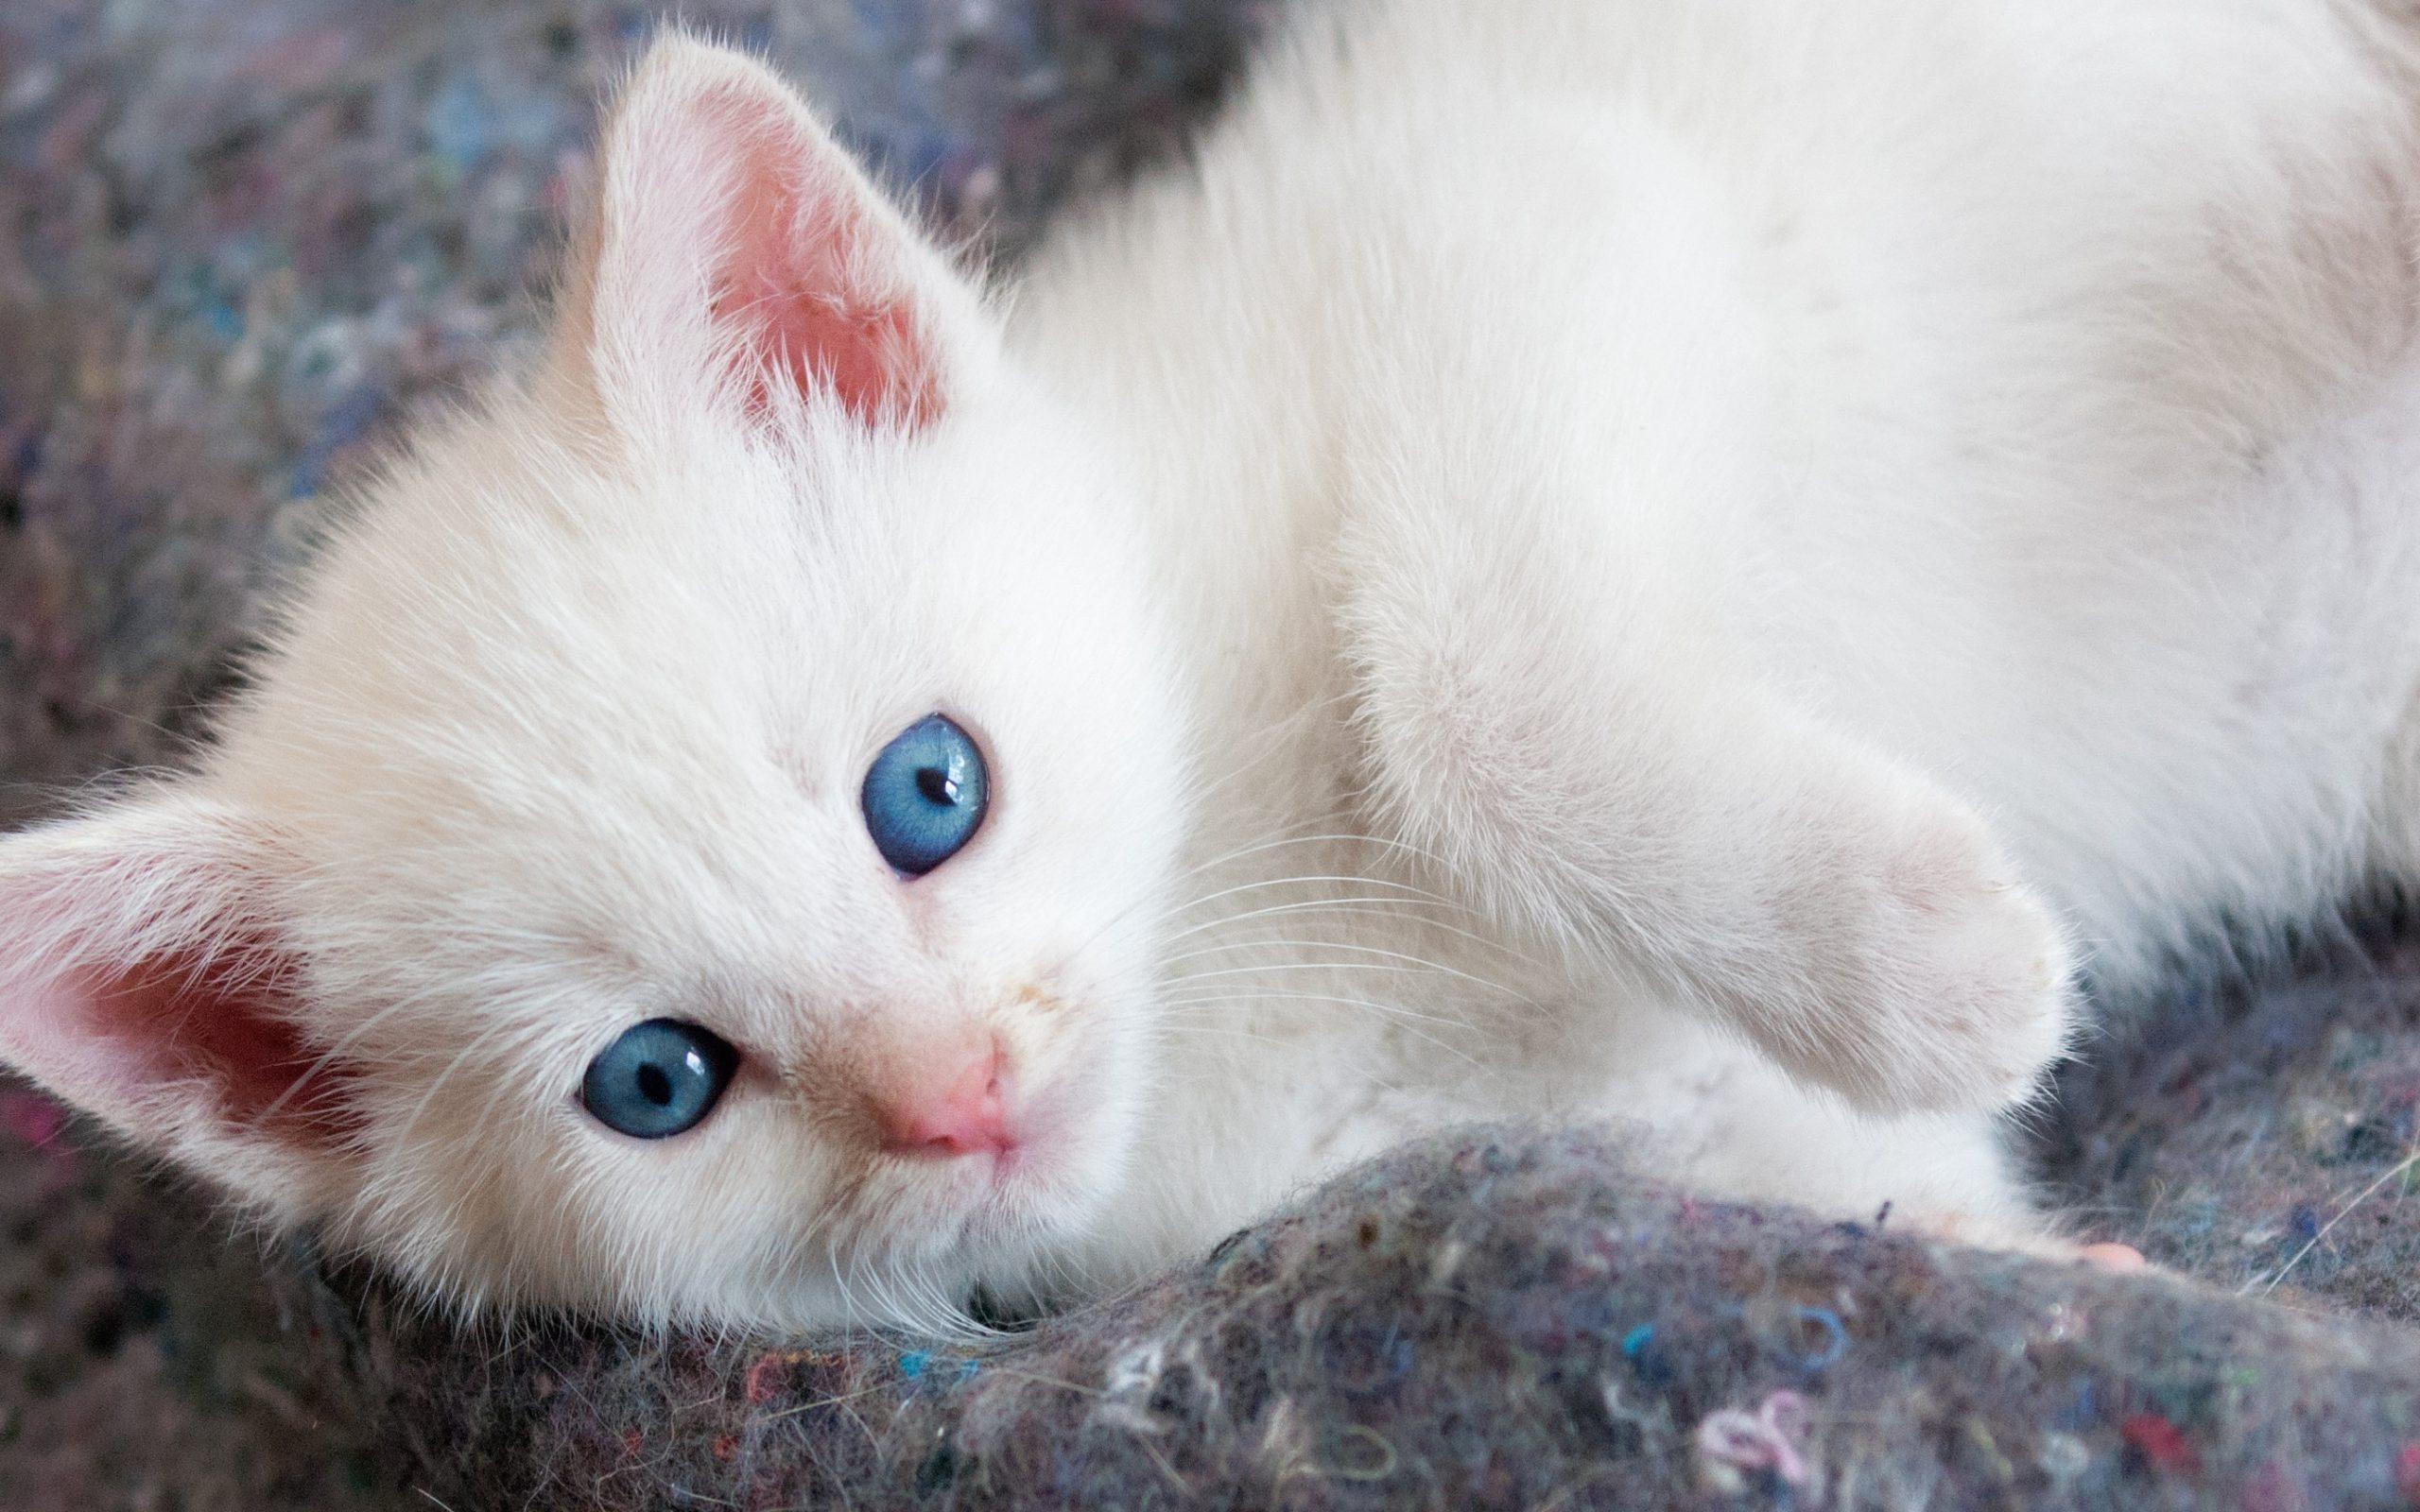 Cute Kittens Wallpaper For Iphone Beautiful White Kitten With Blue Eyes Hd Wallpaper